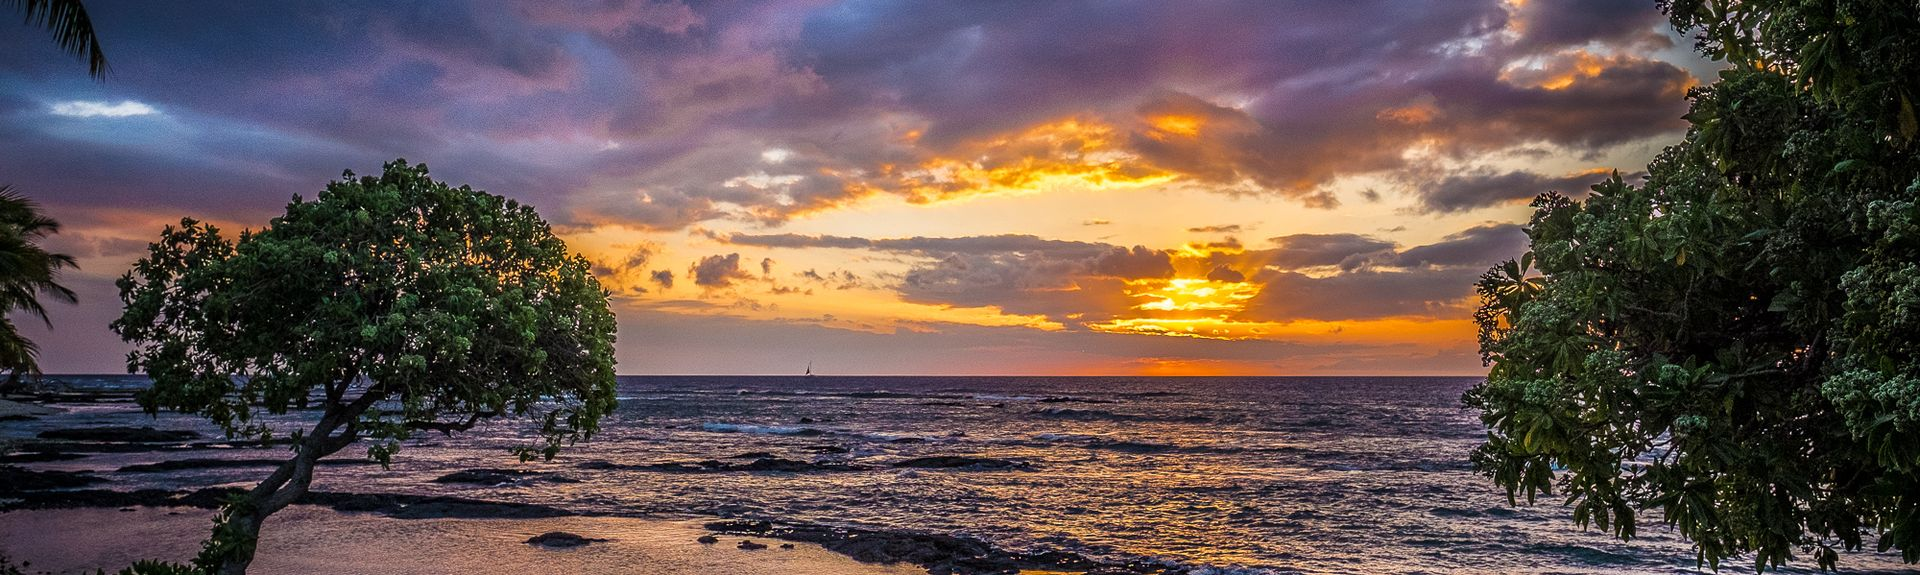 Mauna Kea Beach, Waimea, HI, USA